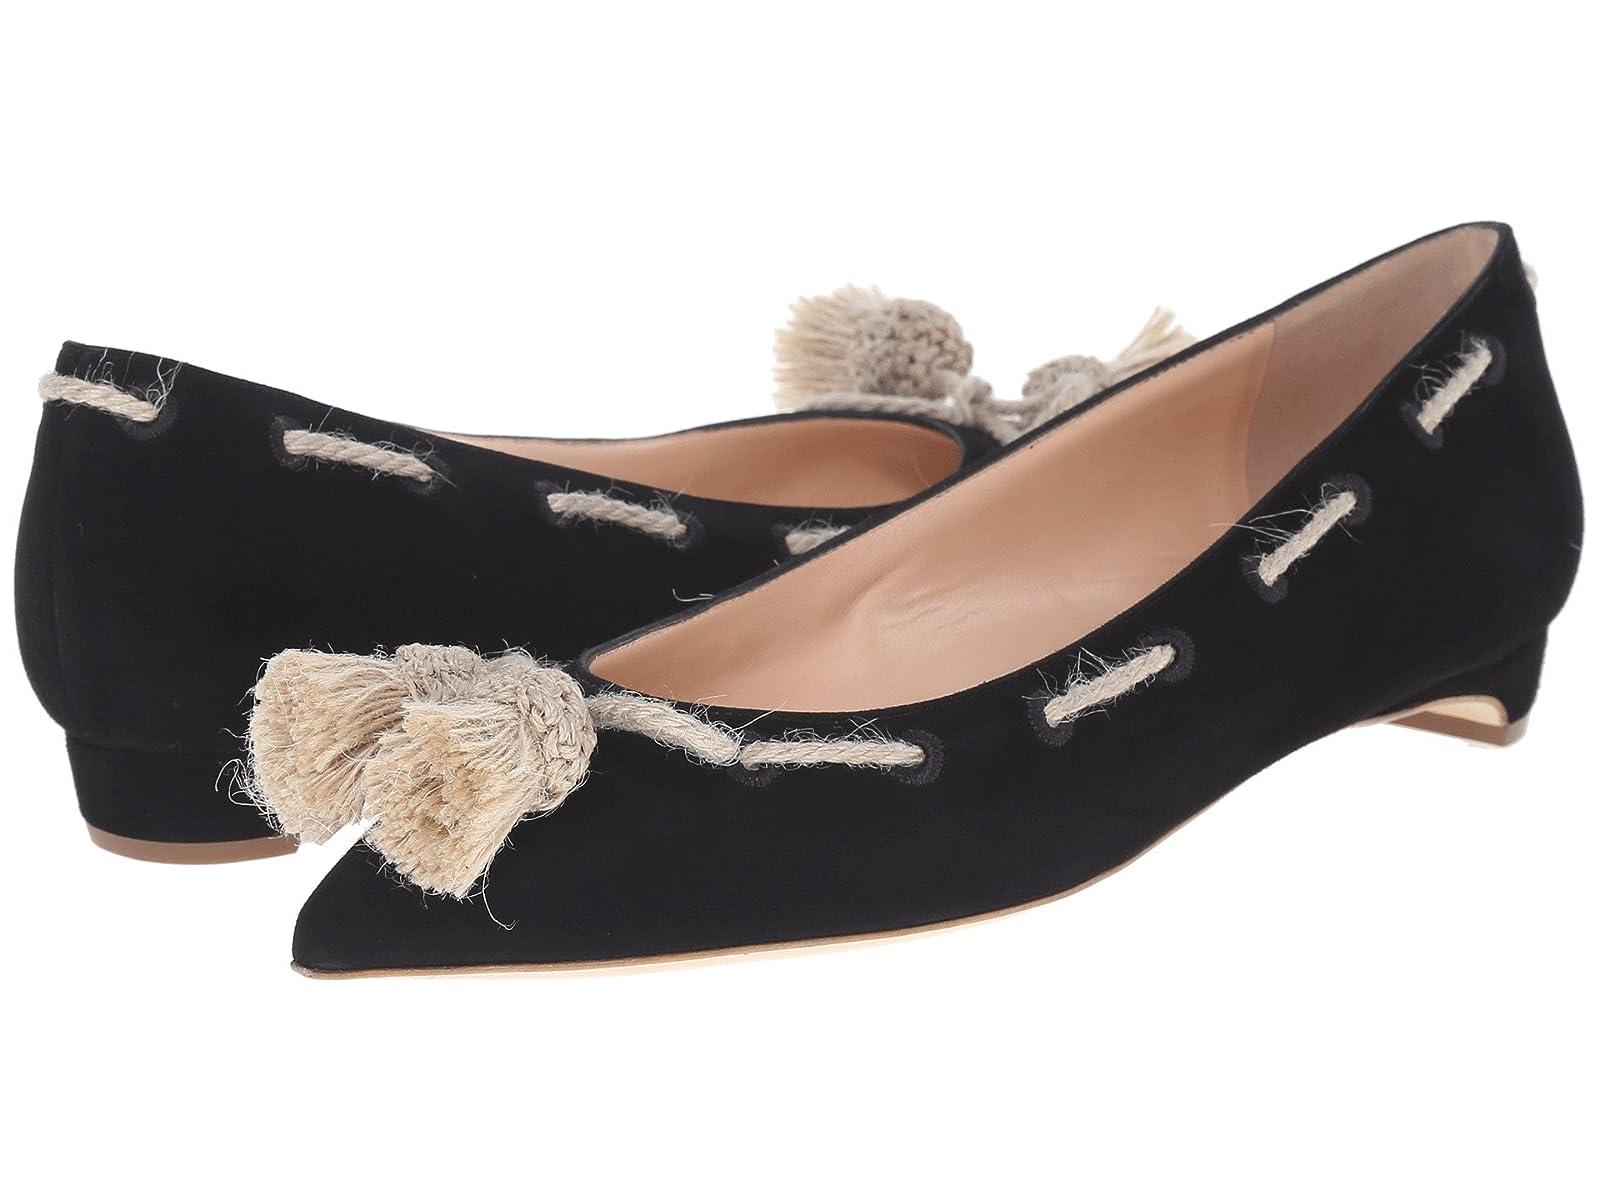 Rupert Sanderson Jamal Suede Flats with TasselsCheap and distinctive eye-catching shoes